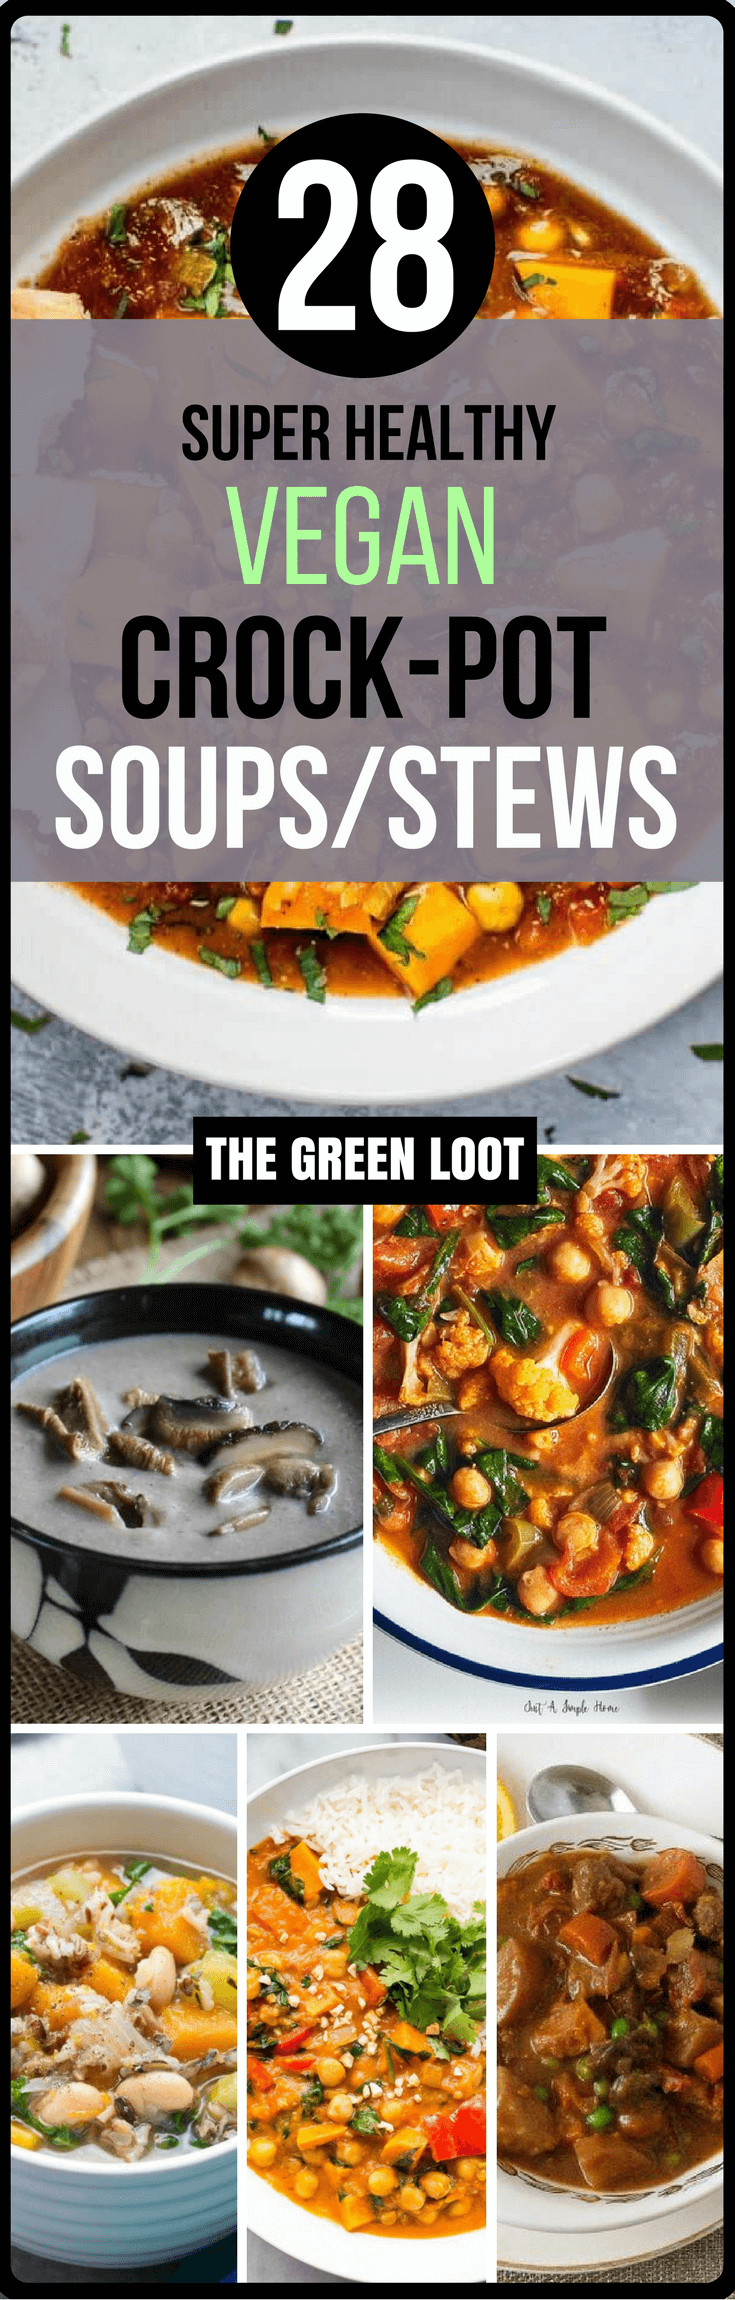 Easy Vegan Crock Pot Recipes  The Best 28 Vegan Crockpot Soups Stews Recipes Easy